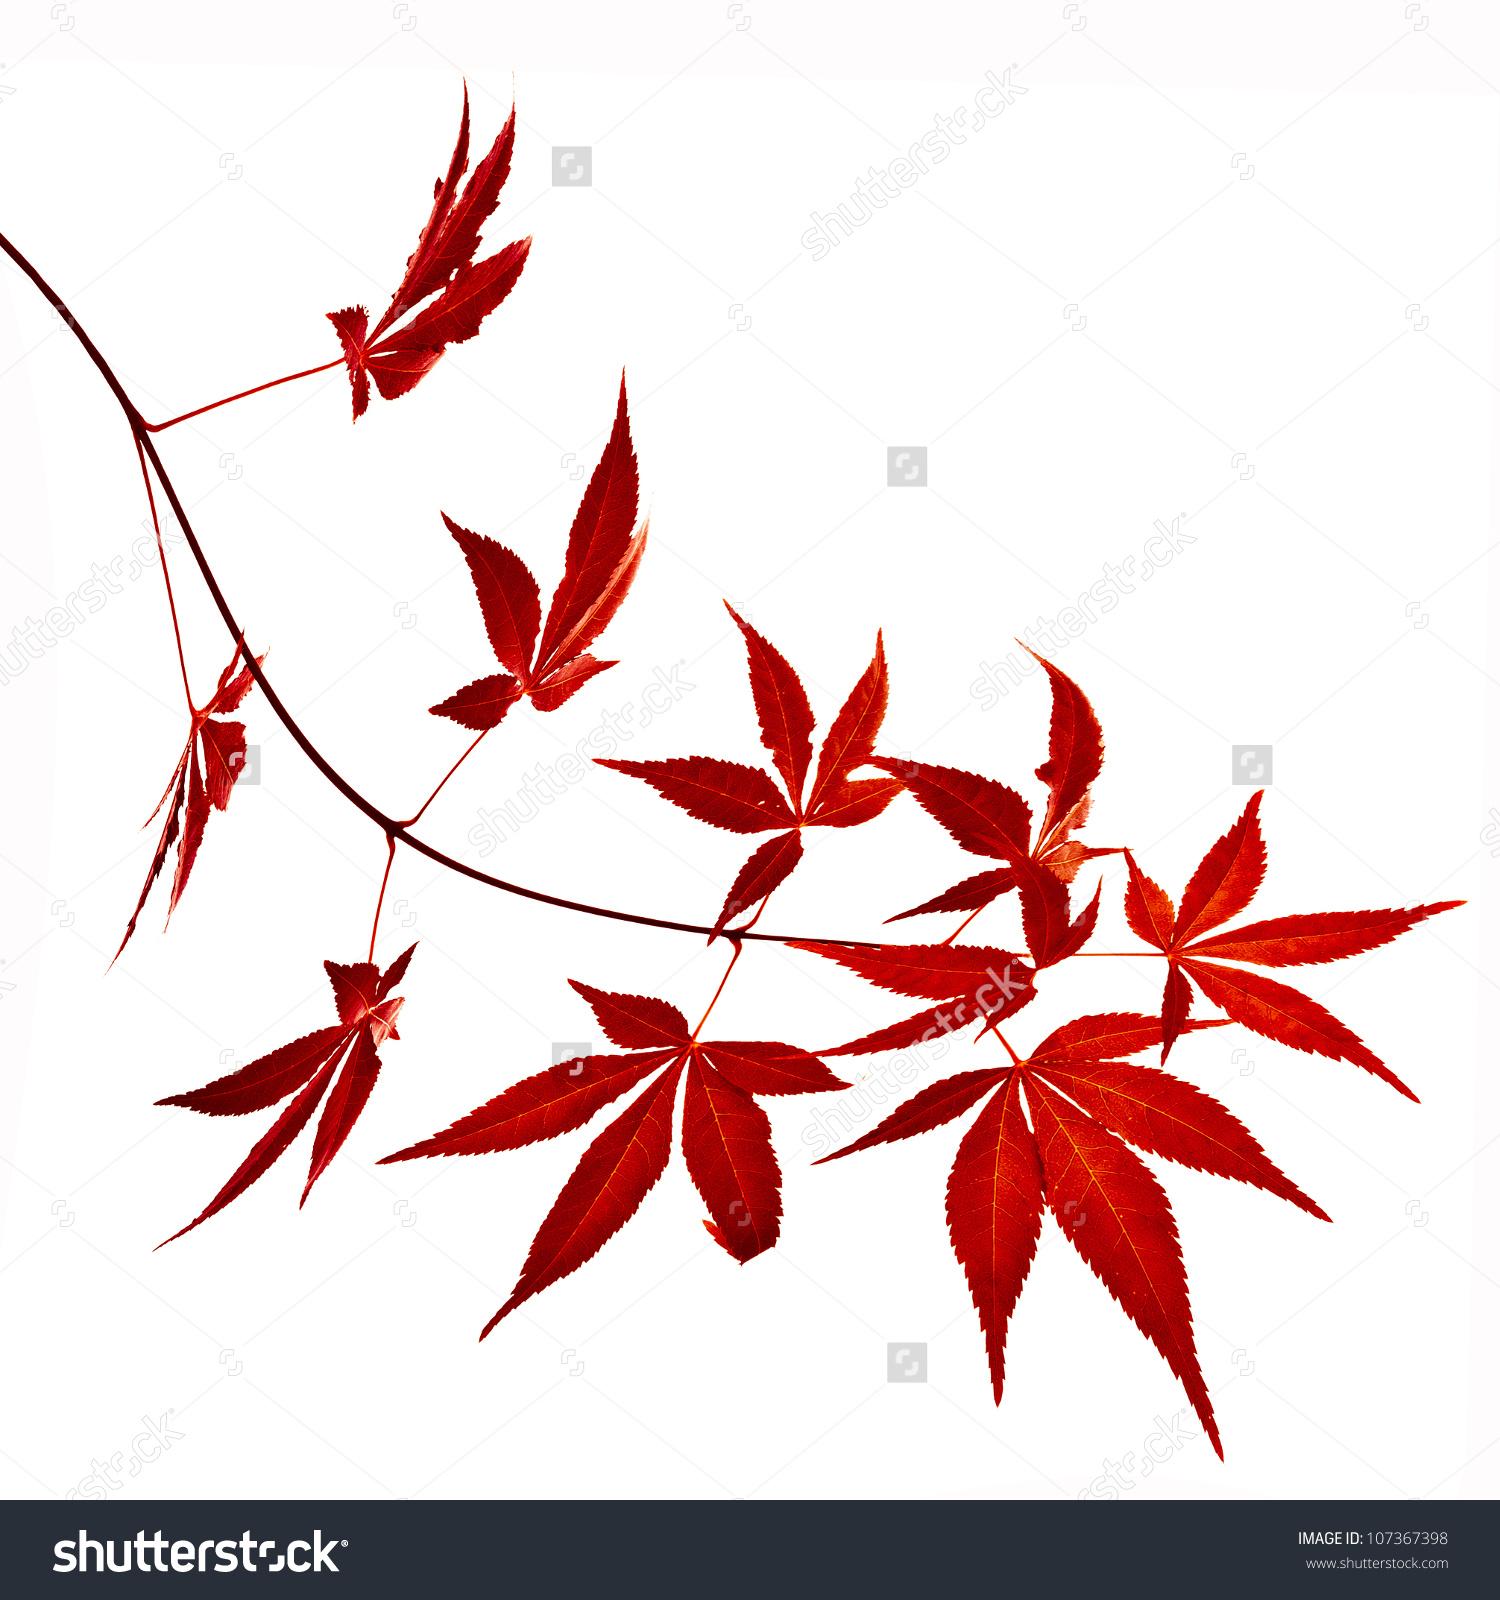 Autumn Foliage Japanese Red Maple Tree Stock Photo 107367398.